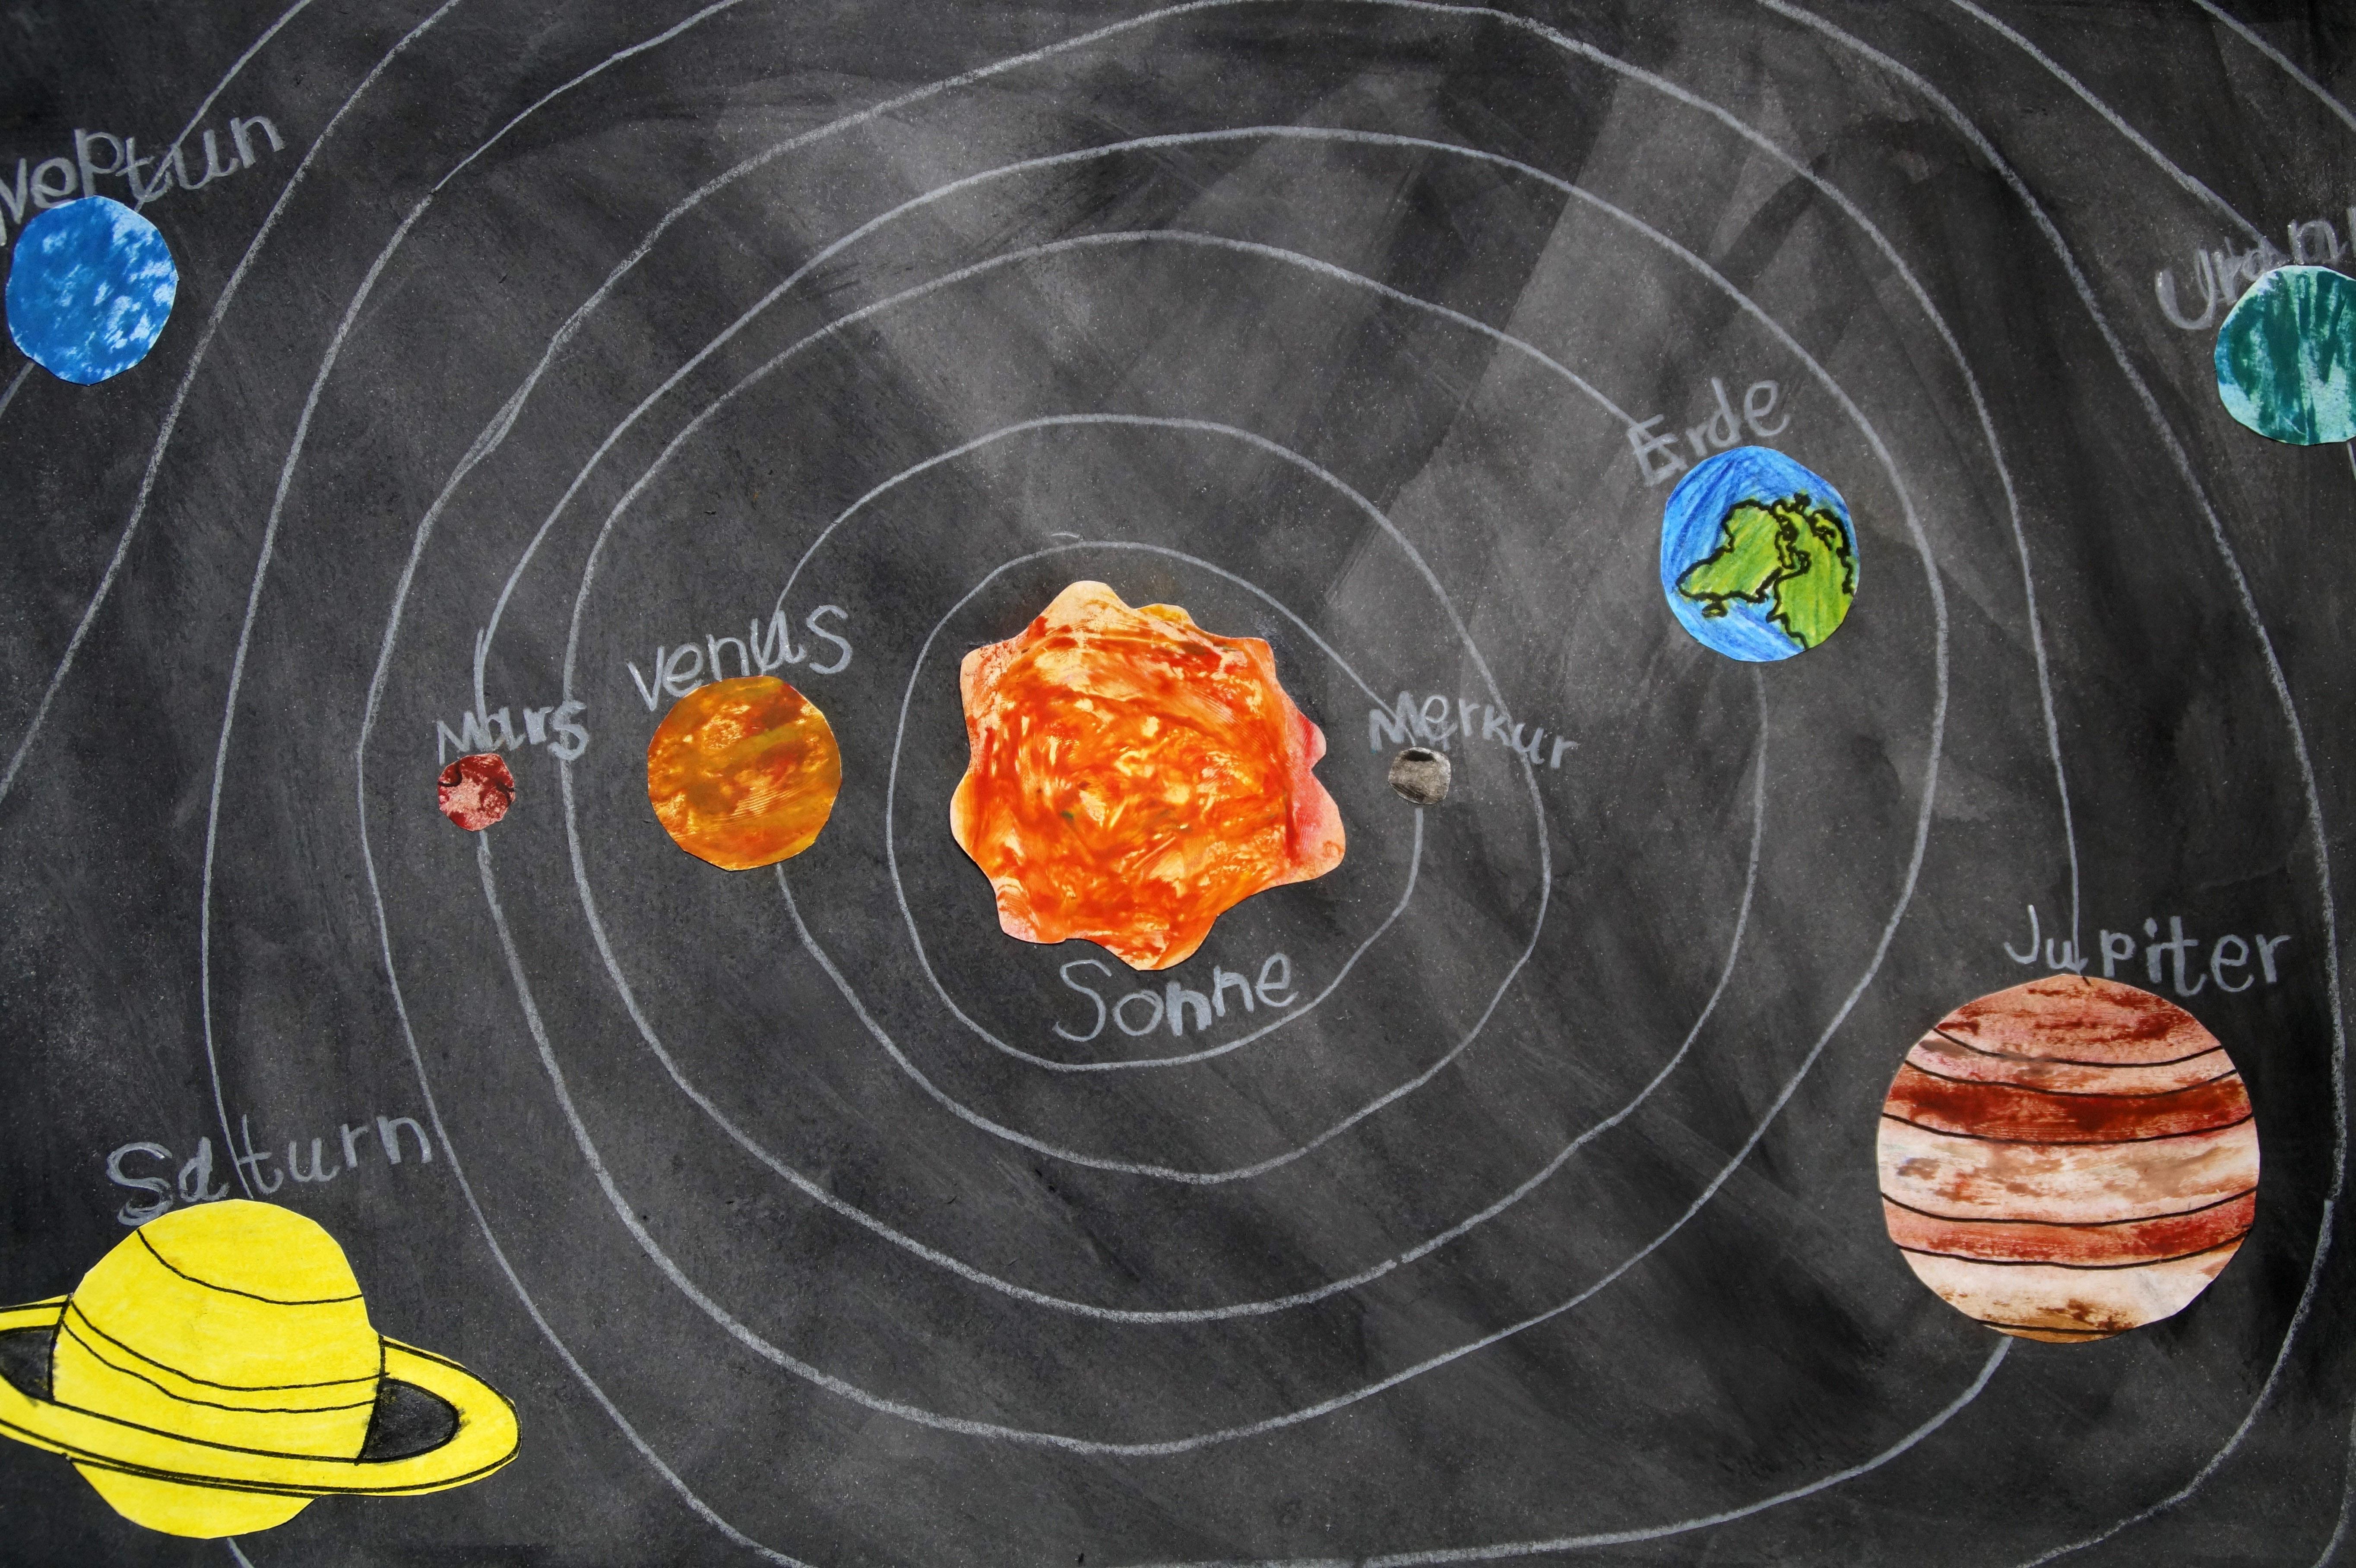 solar system sketch - photo #47